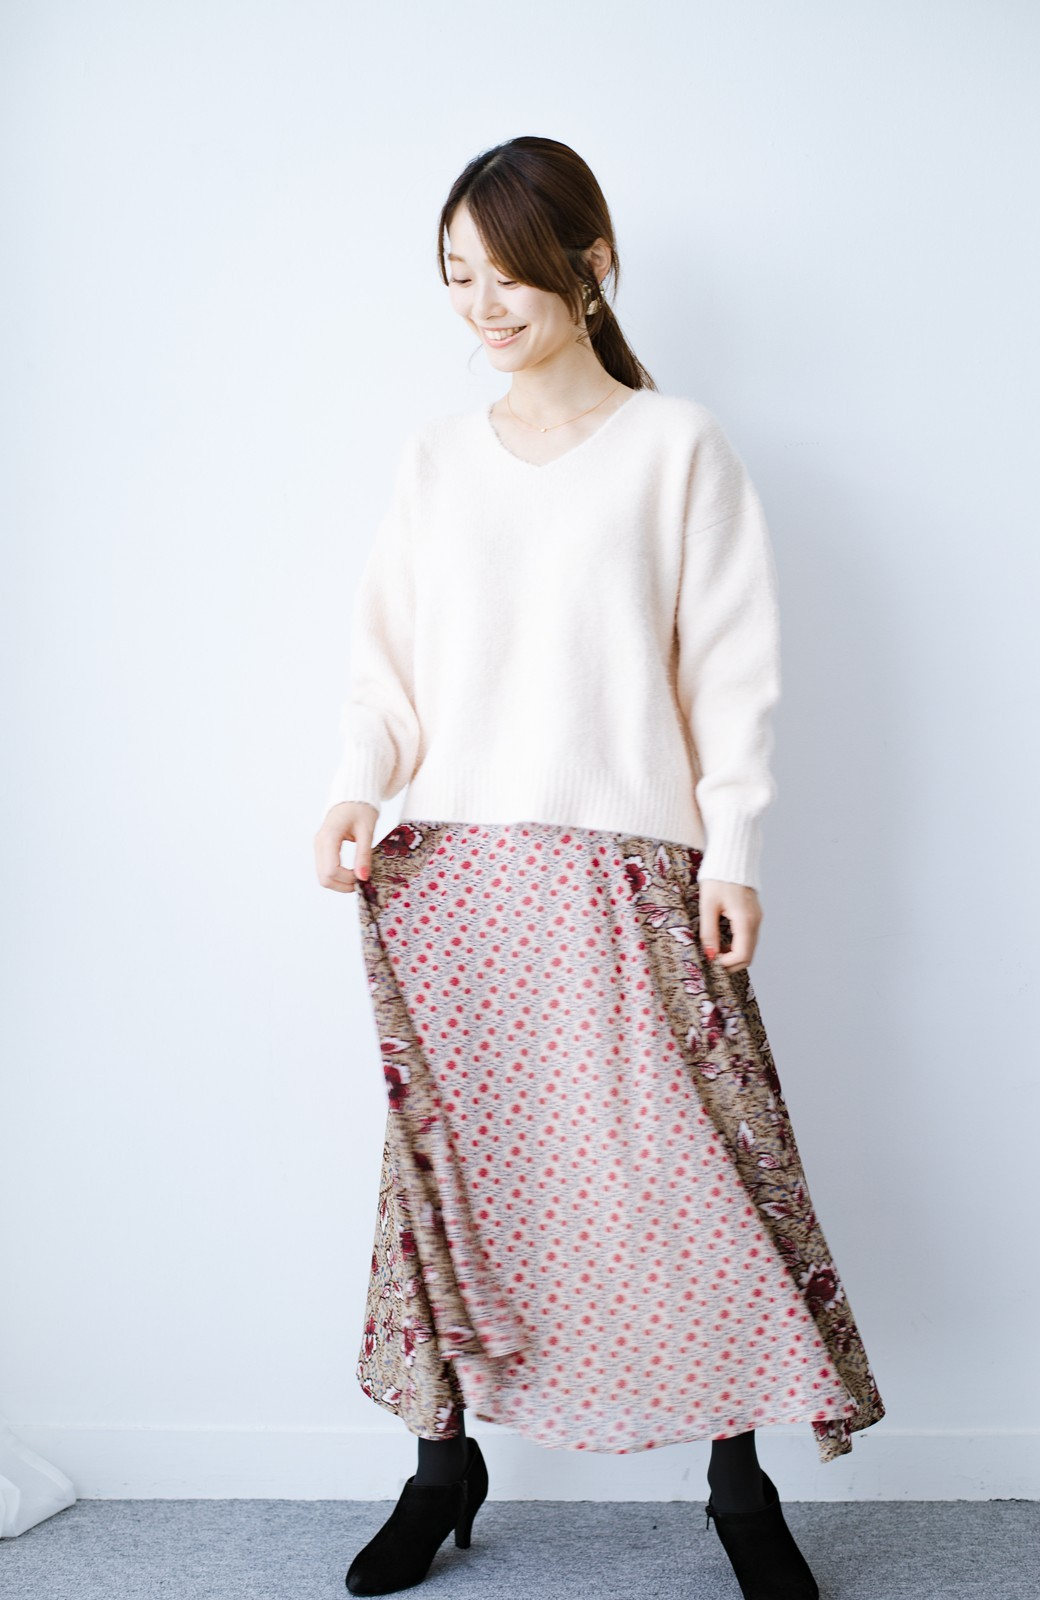 haco! 【洗濯機洗いOK】シンプルなトップスに合わせるだけでかわいくなれる MIX柄スカート <ベージュ系その他>の商品写真8